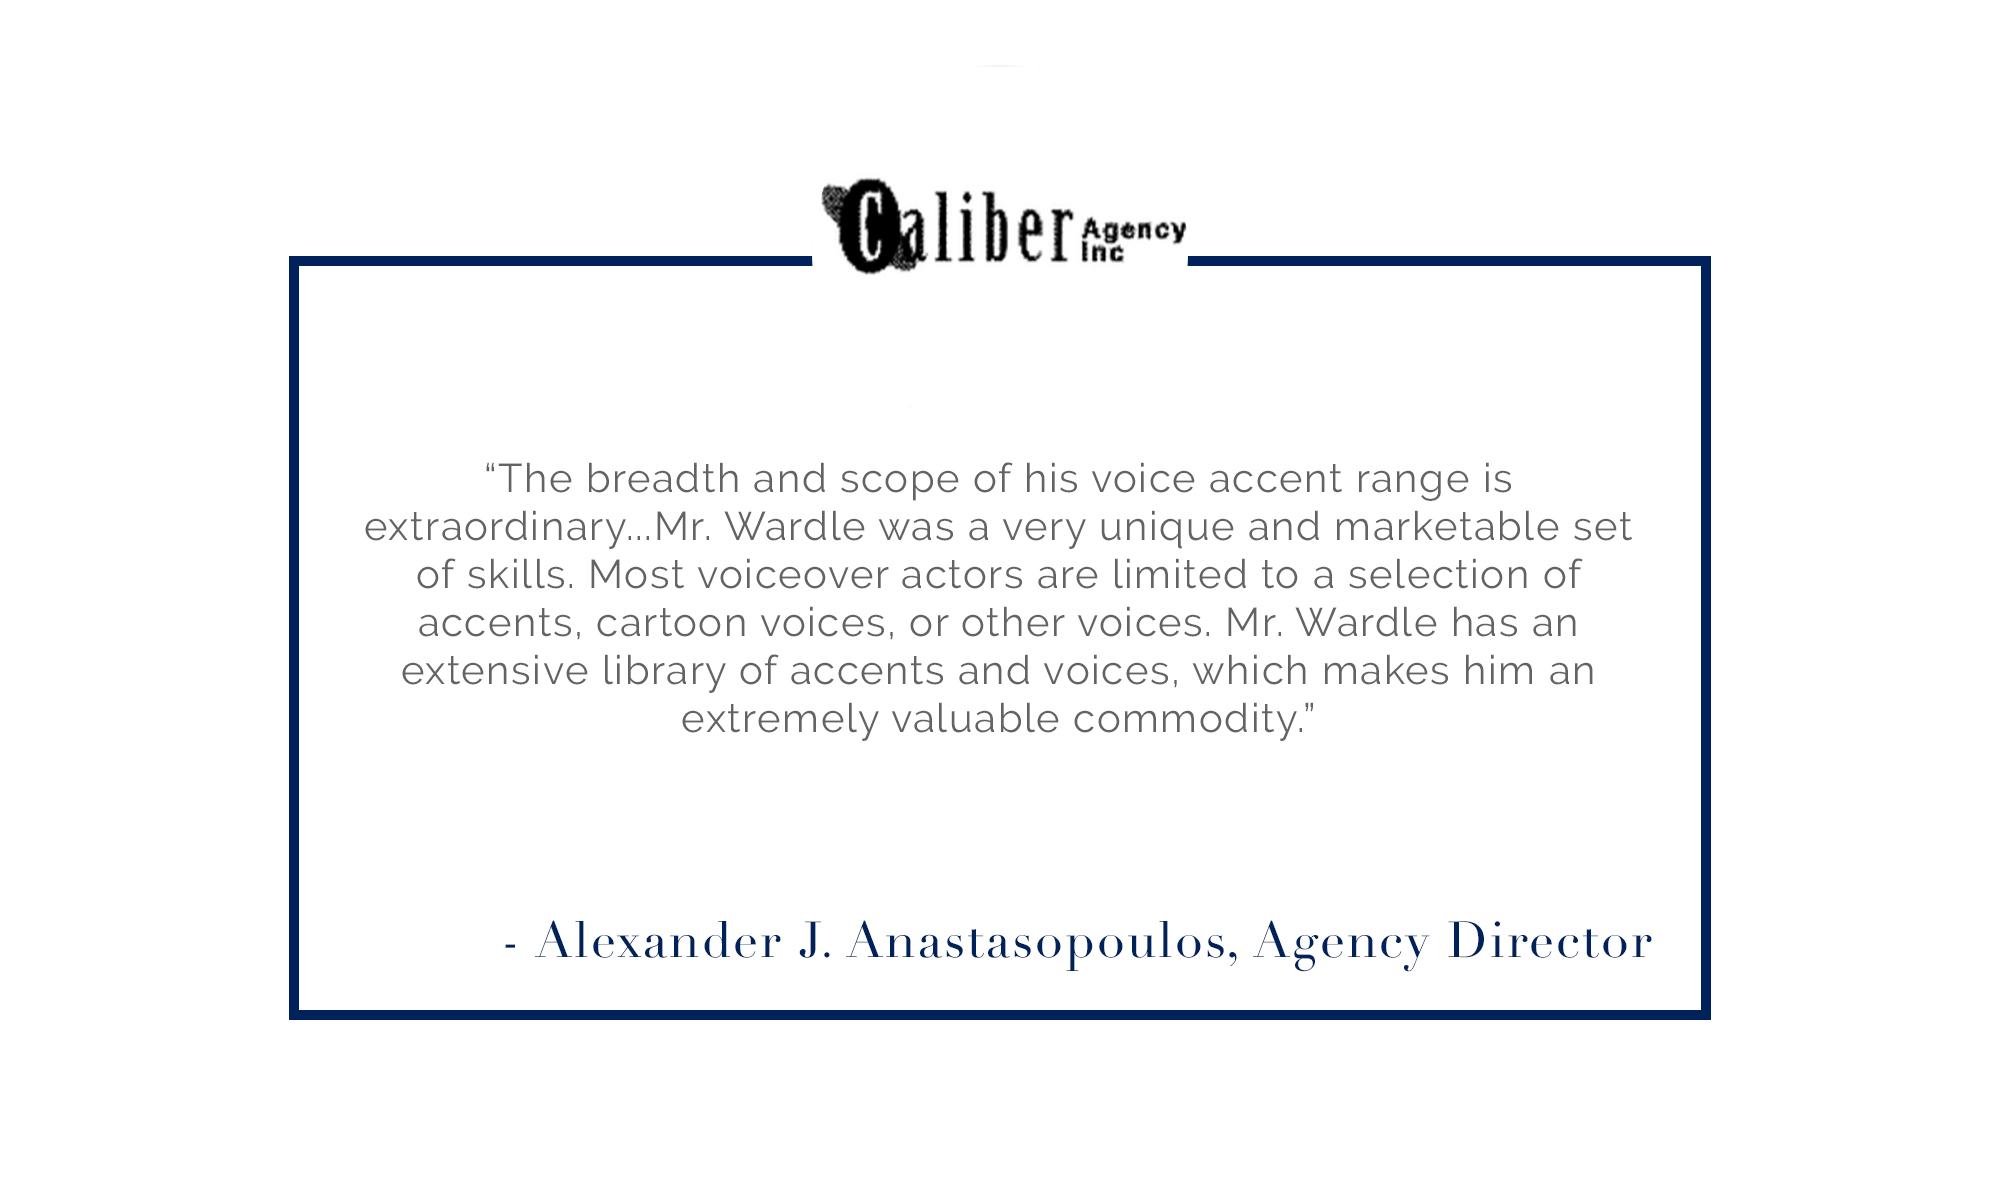 Cailber Agency.jpg